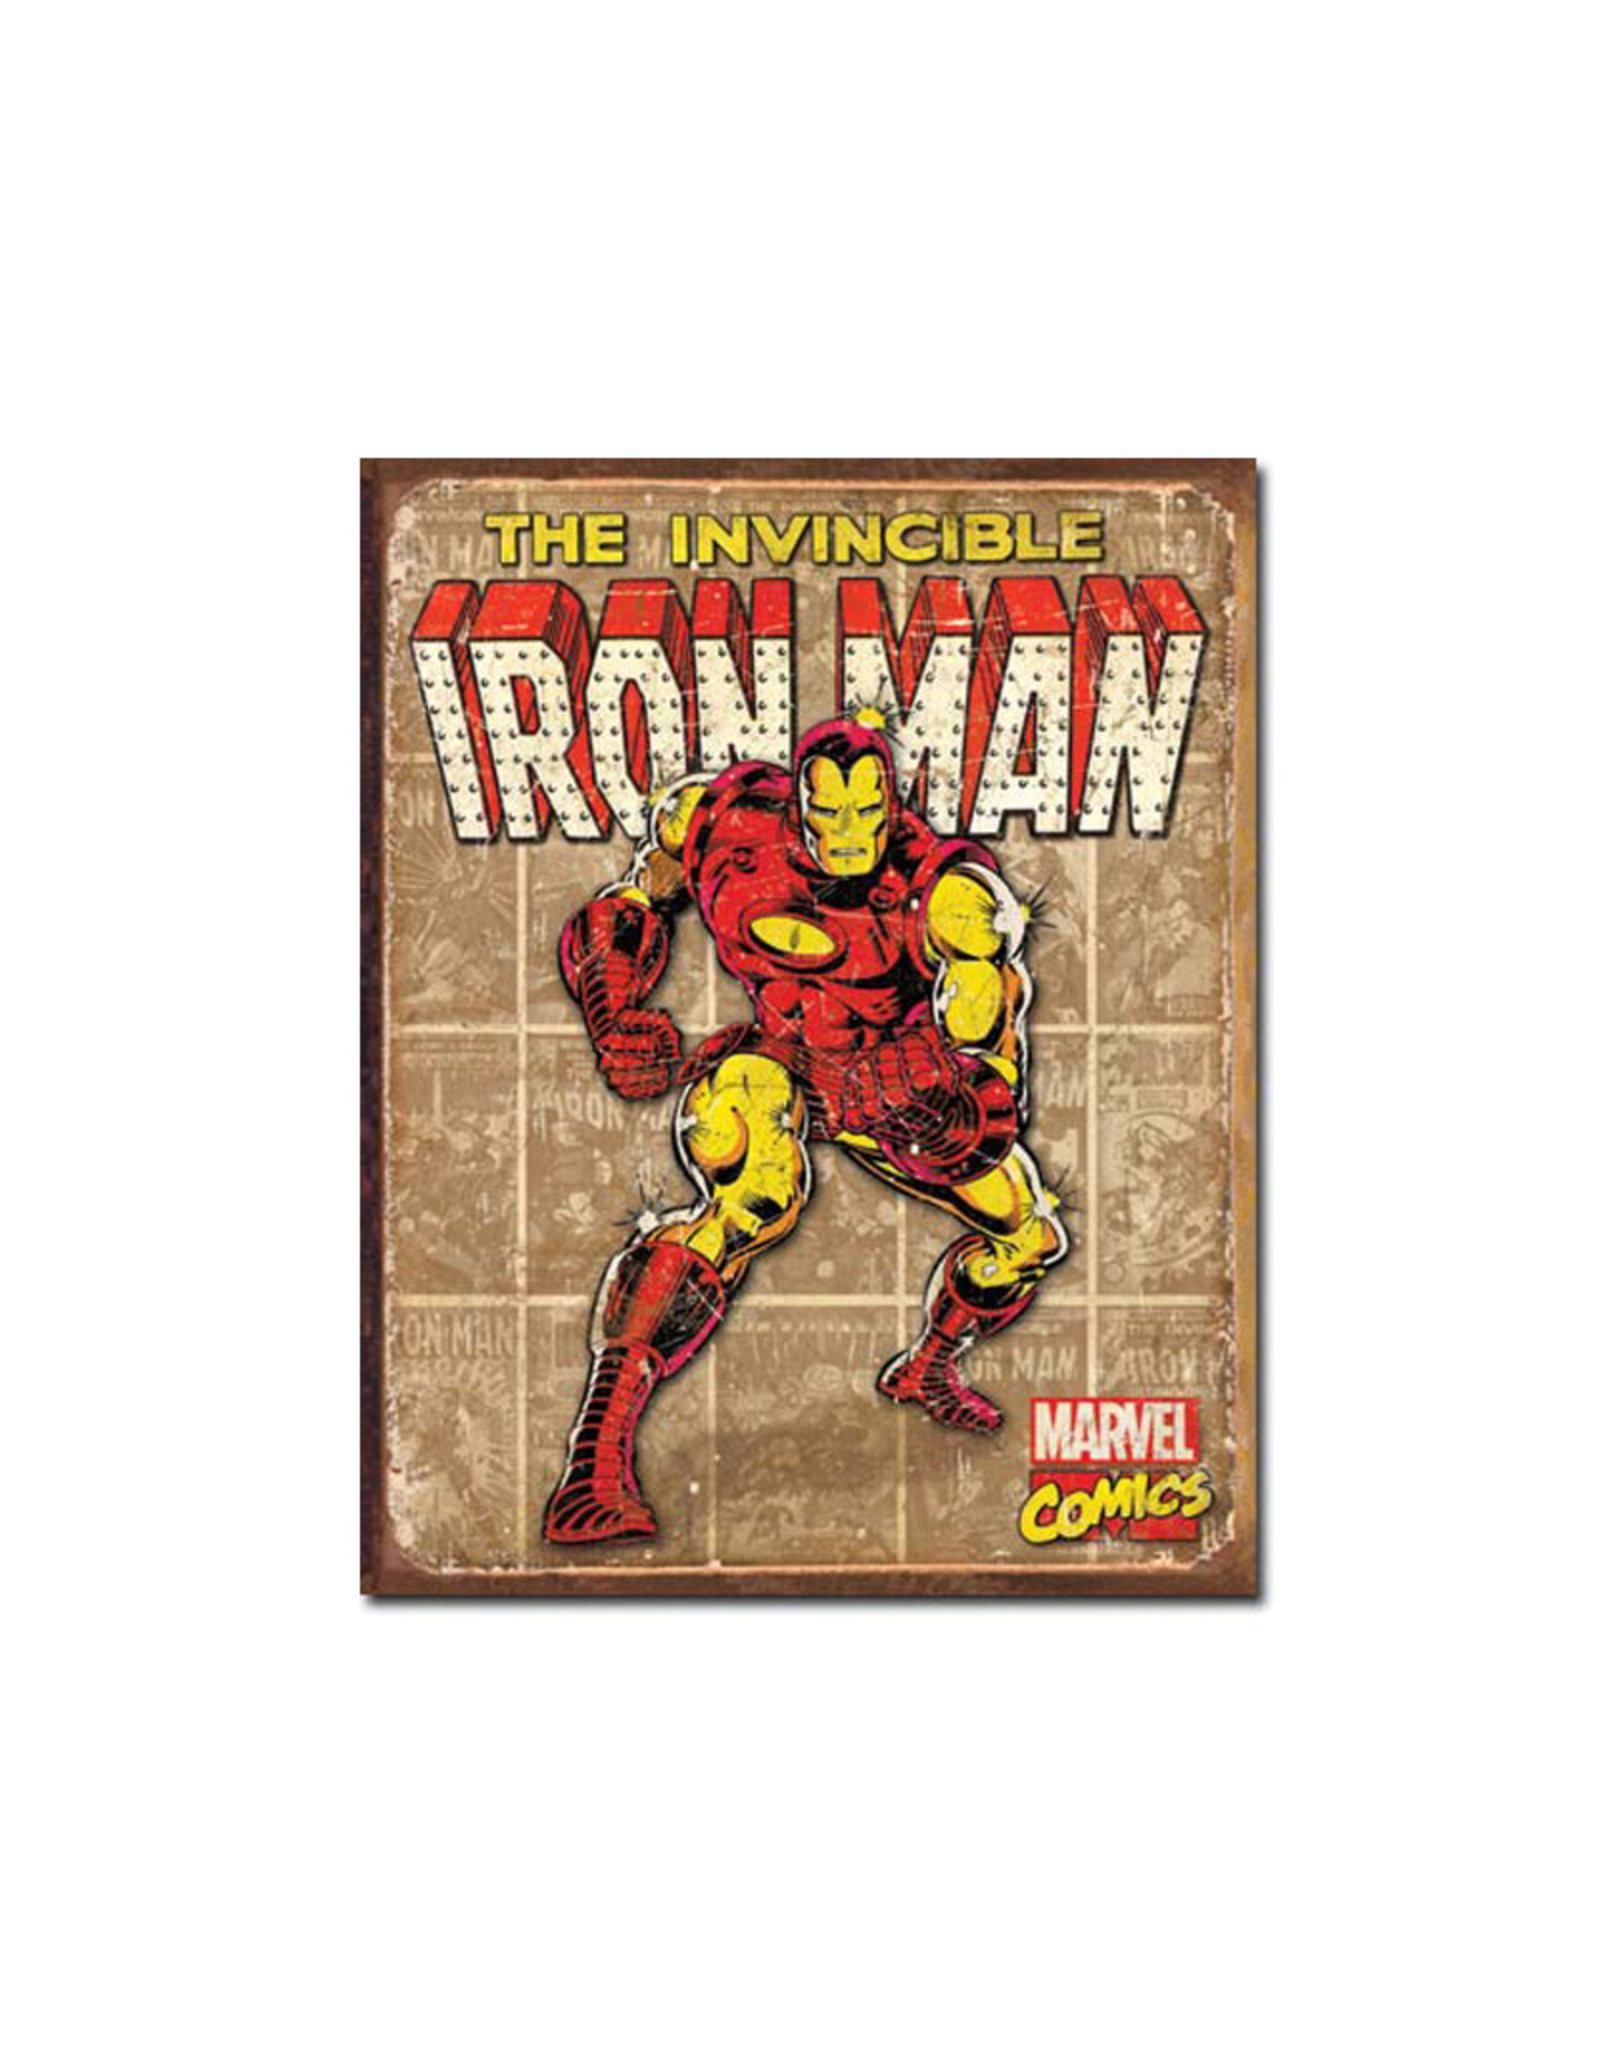 Marvel Marvel ( Metal Sign 12.5 X 16 ) Iron Man Retro